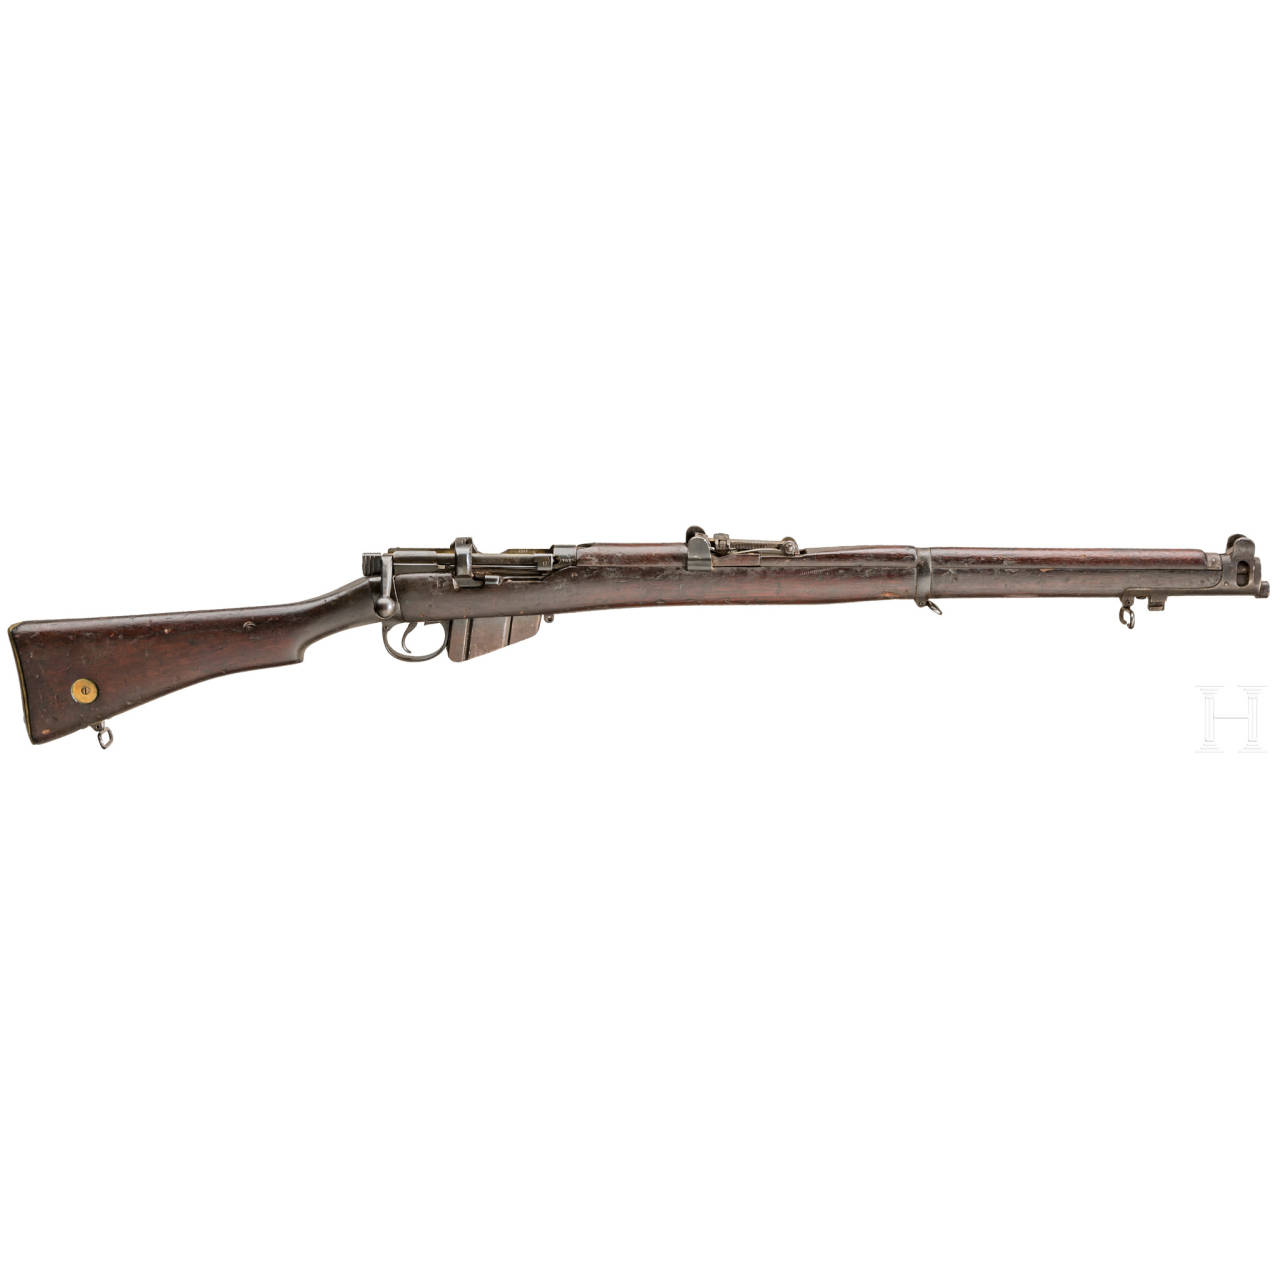 Enfield (SMLE) Rifle Mk III